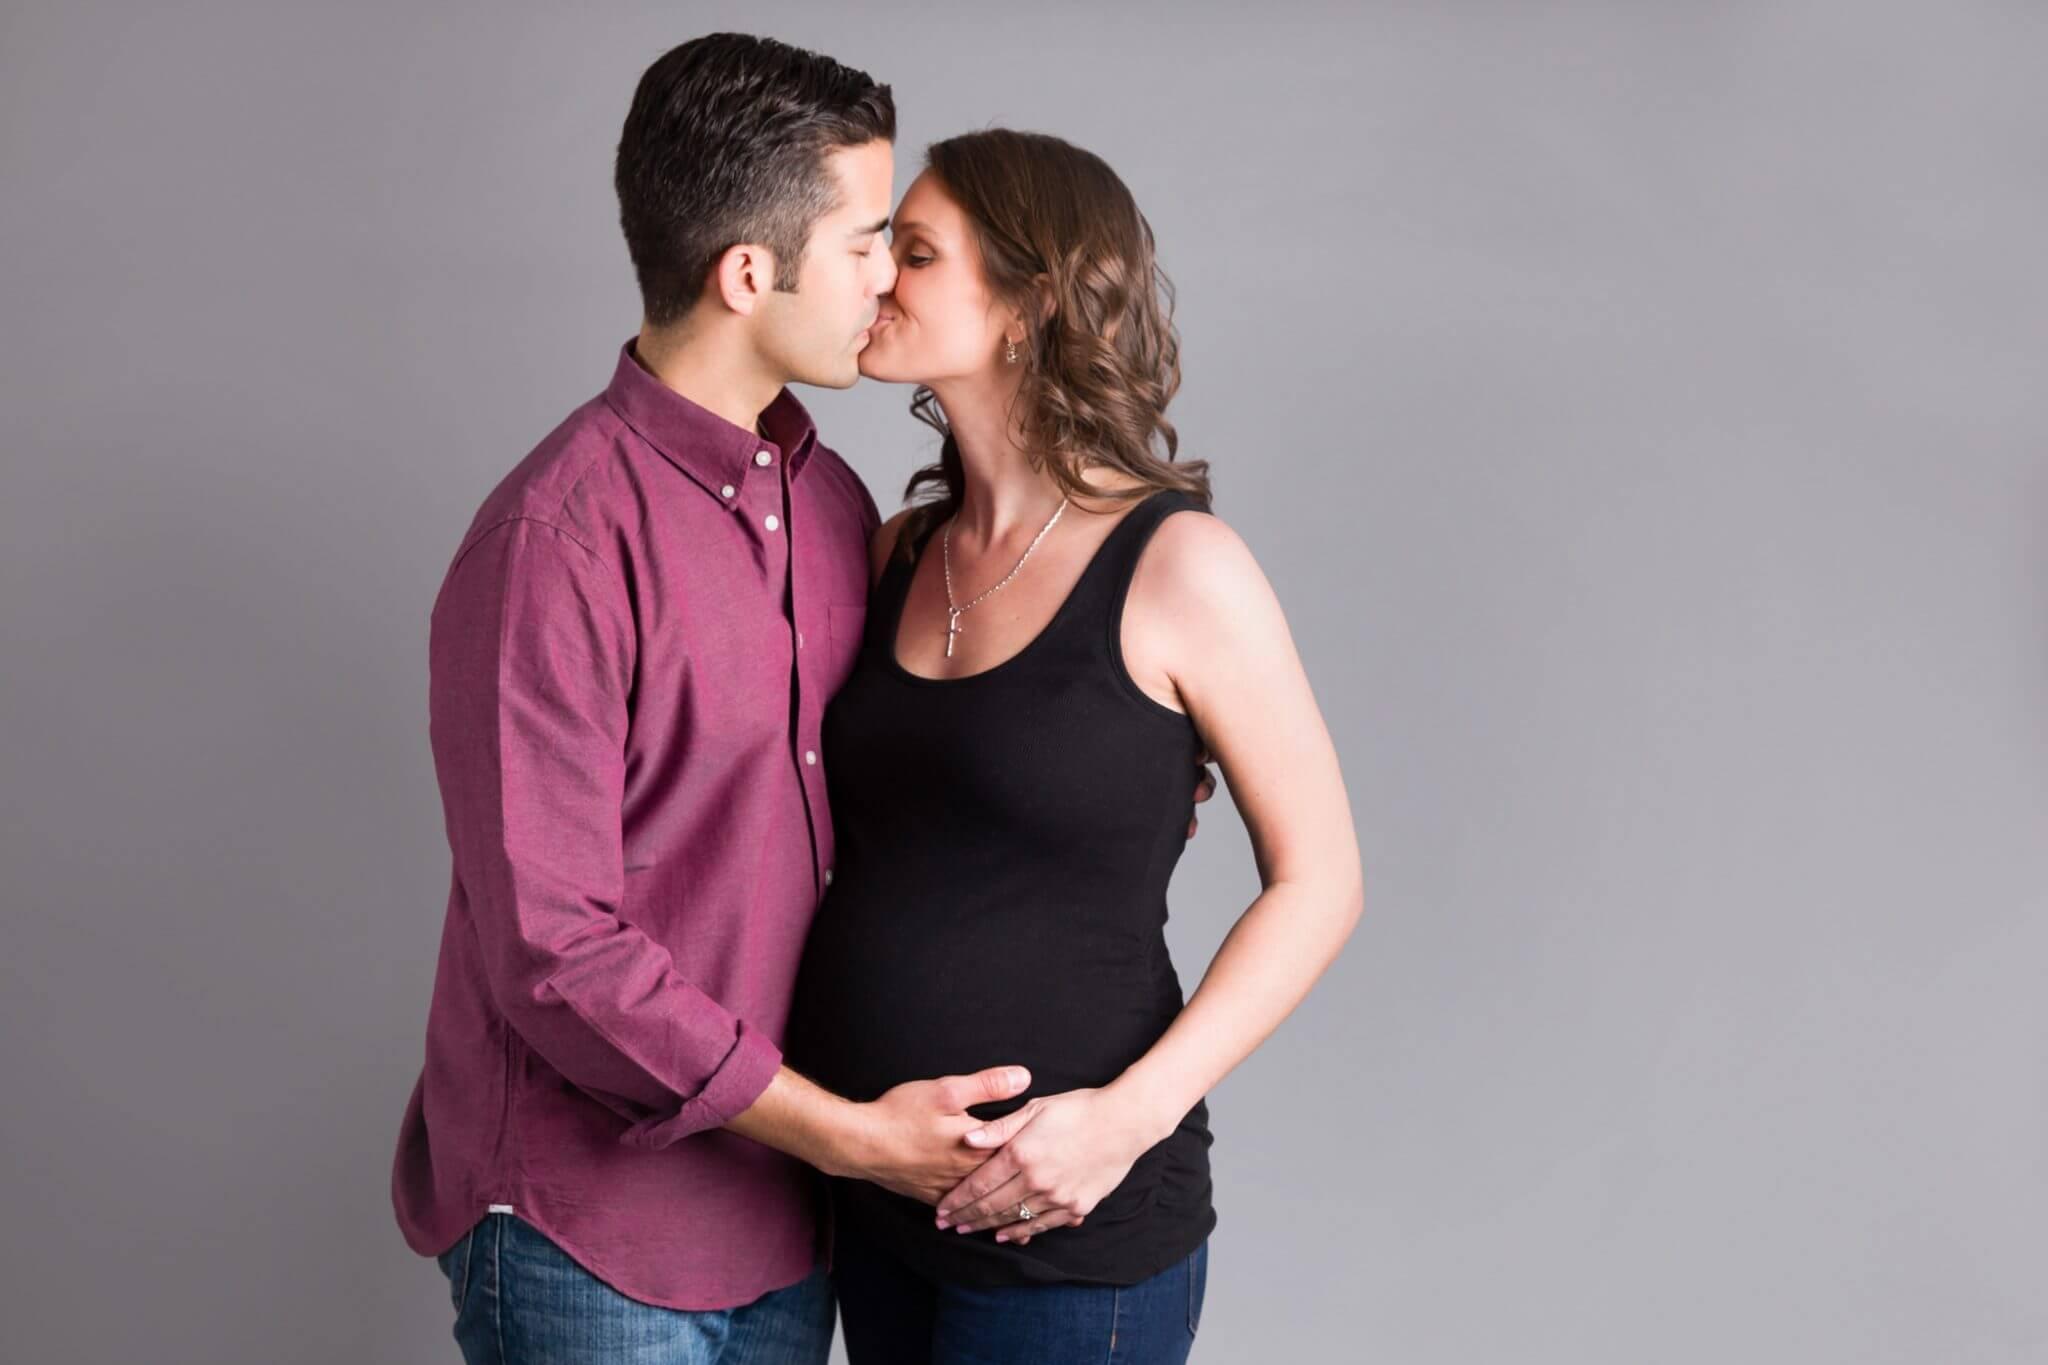 Pittsburgh Maternity Photographer | Maternity Studio Session | V Family